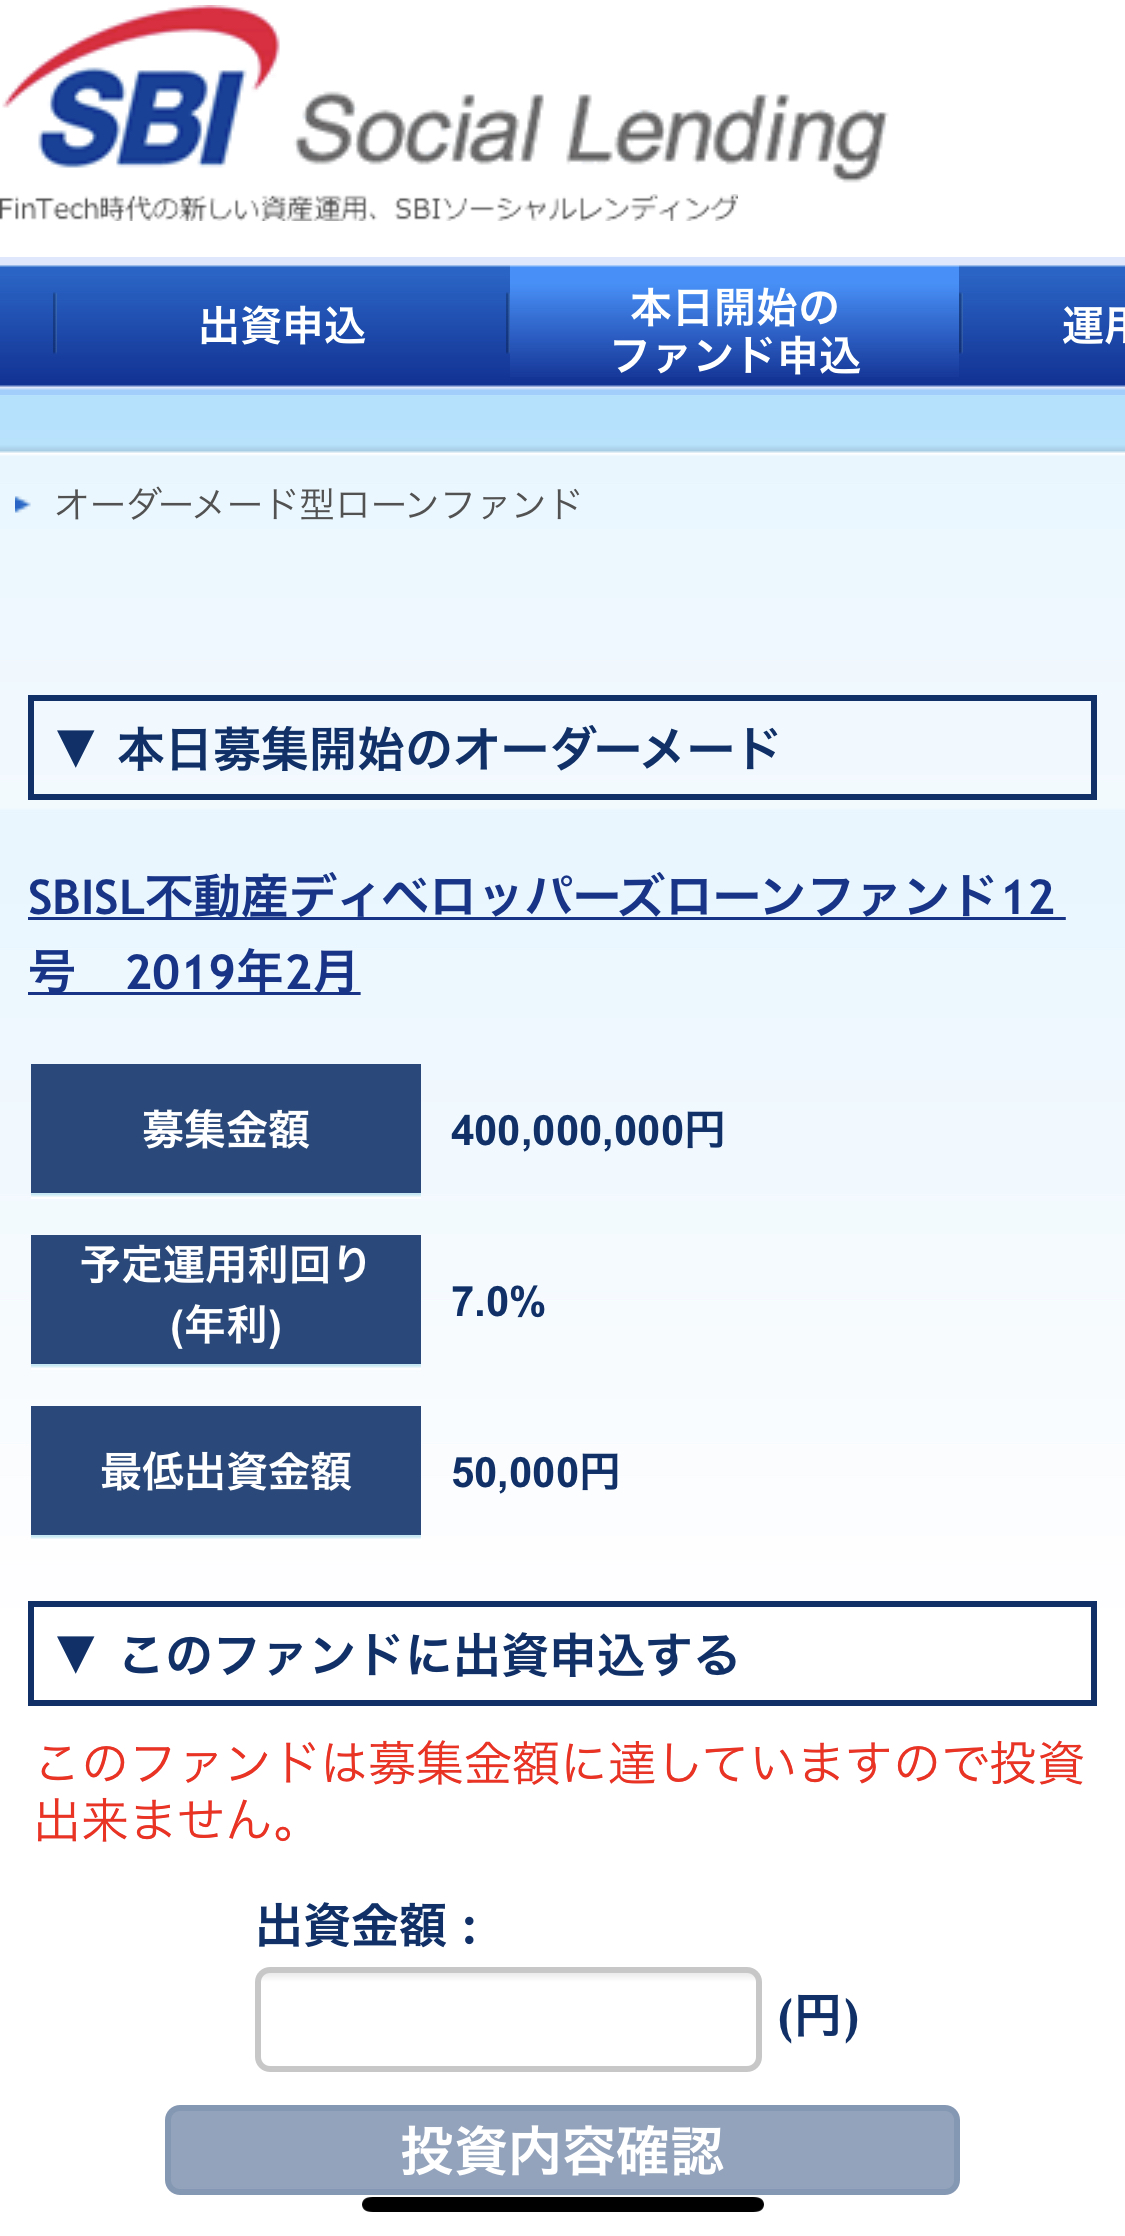 SBIソーシャルレンディング 投資案件